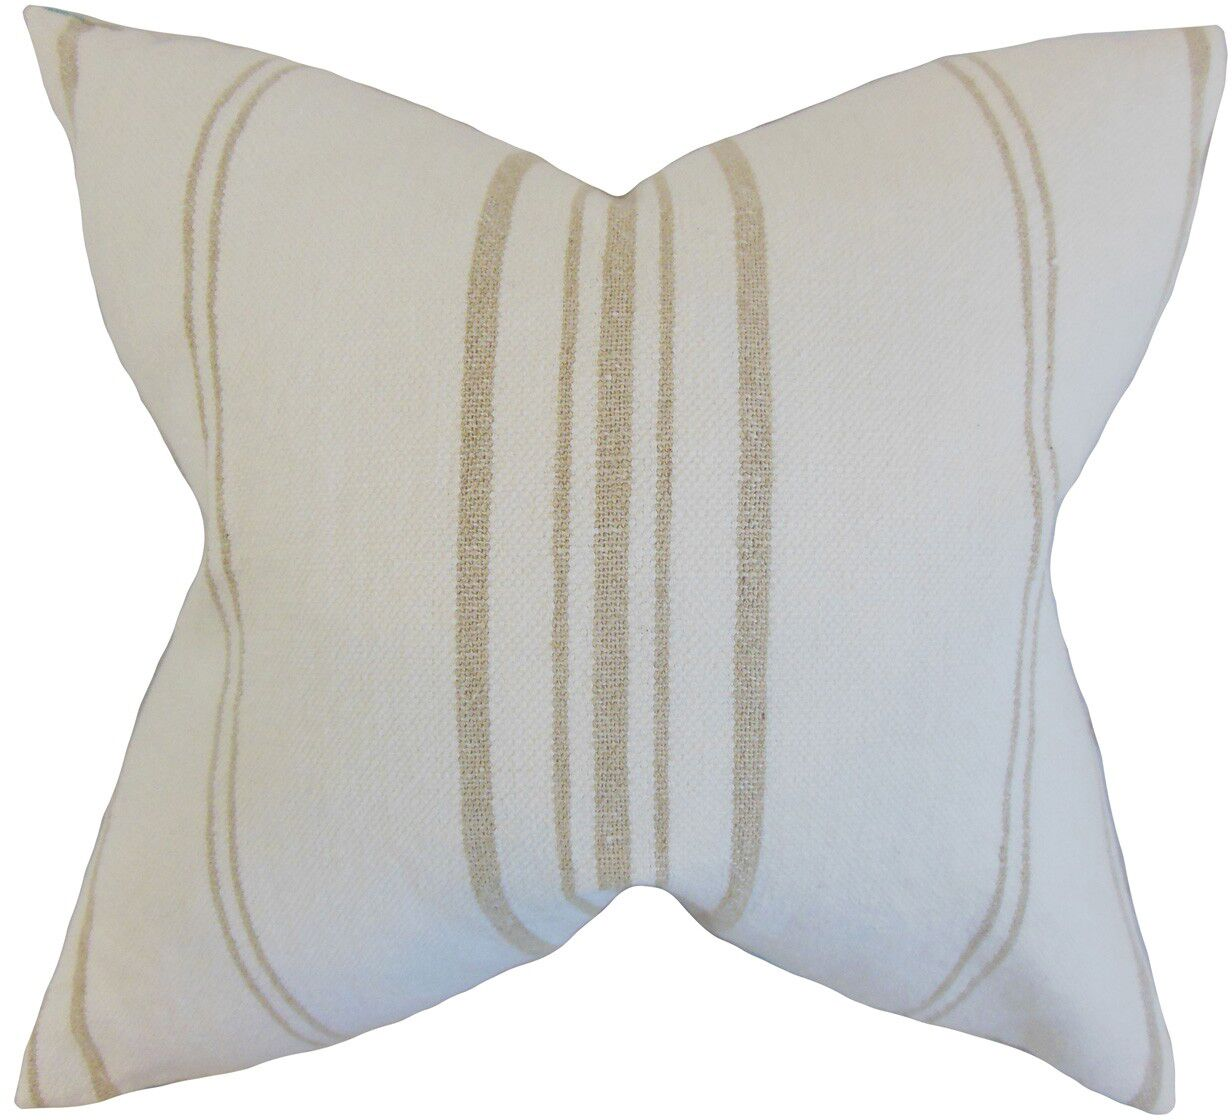 Dharia Linen Throw Pillow Size: 20